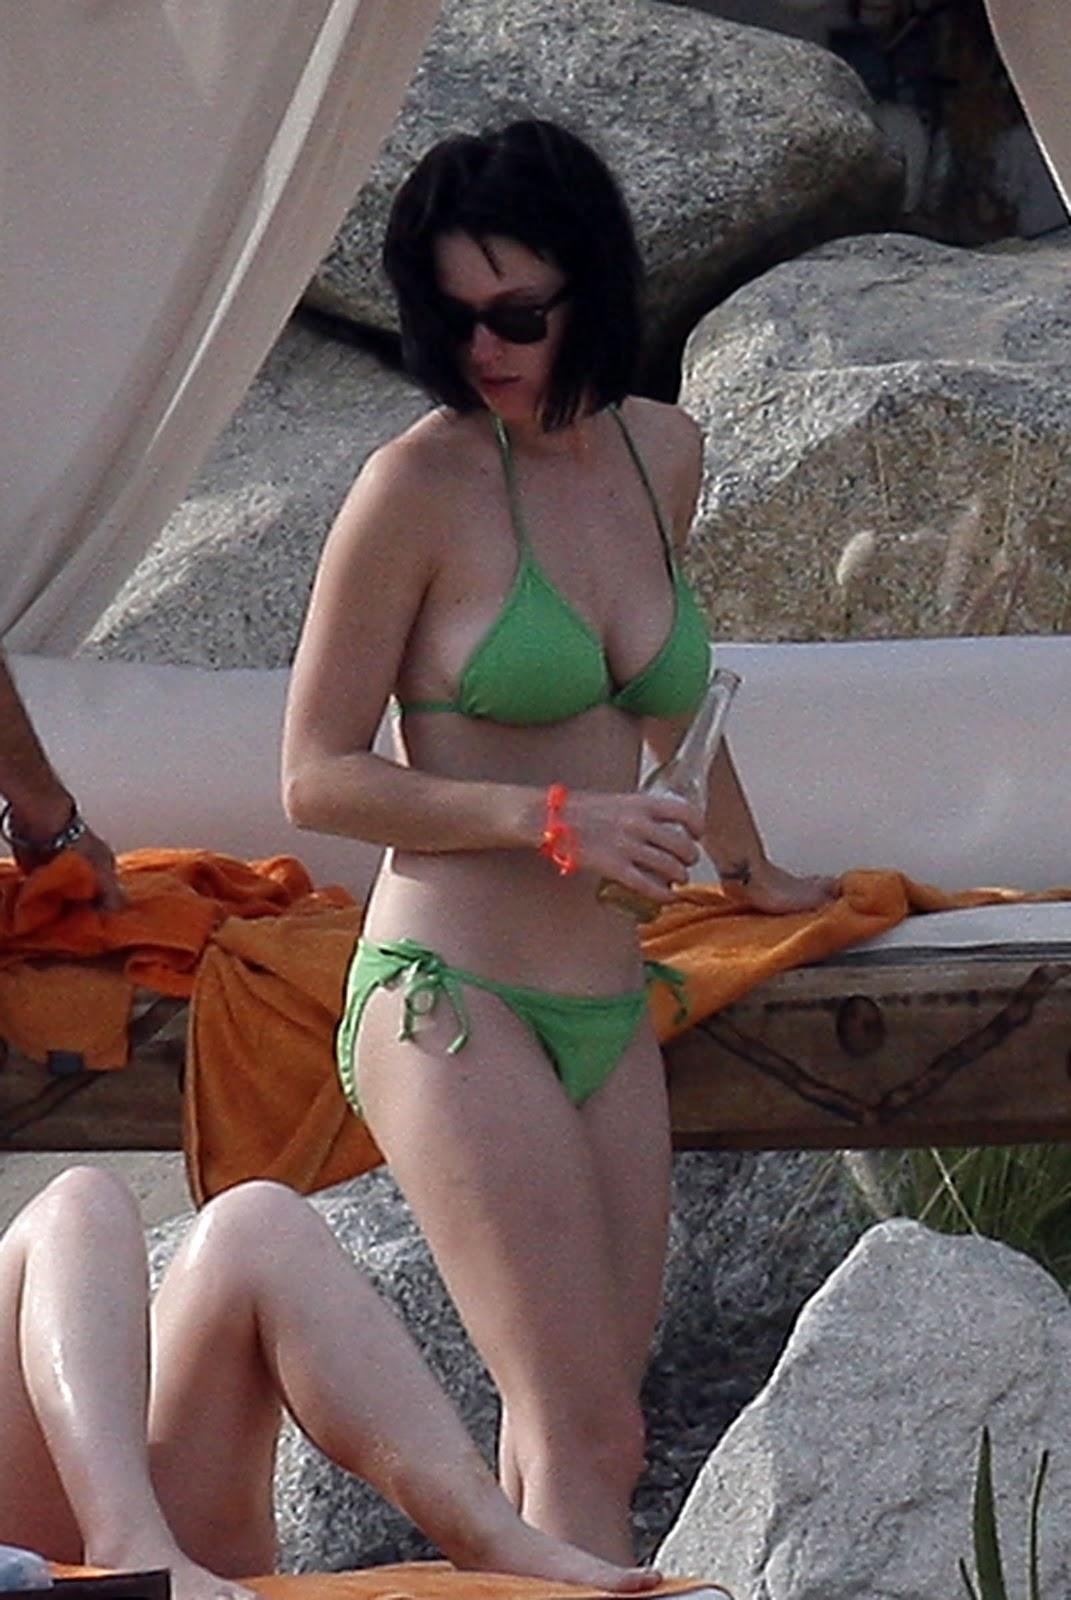 http://3.bp.blogspot.com/_Bo8ISOFbneI/TOw07SsCyiI/AAAAAAAAAYA/e-fOx880MDY/s1600/Katy_Perry_Mexico_Beach_27.jpg